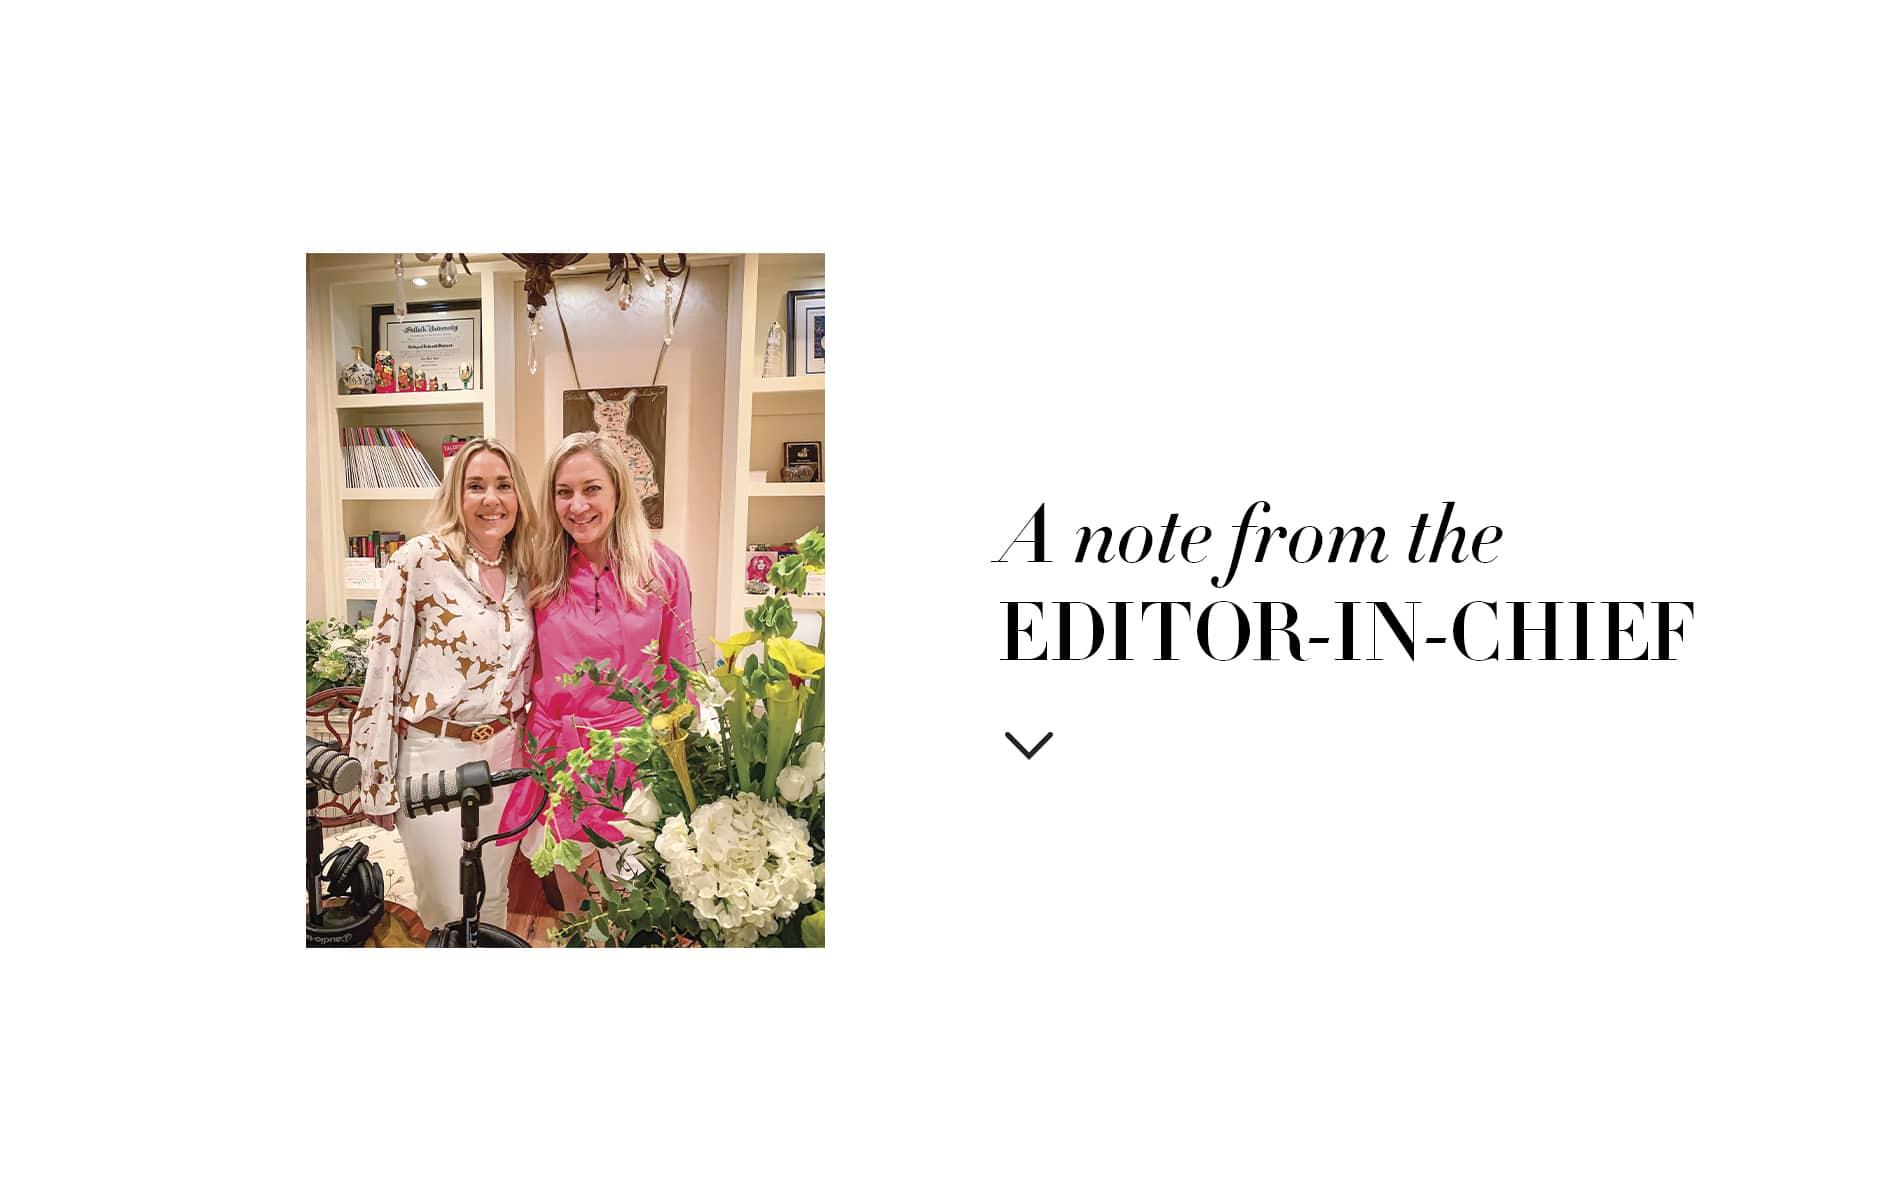 VIE Magazine, Lisa Burwell, Editor in Chief Note, Laurie Hood, Alaqua, Alaqua Animal Refuge